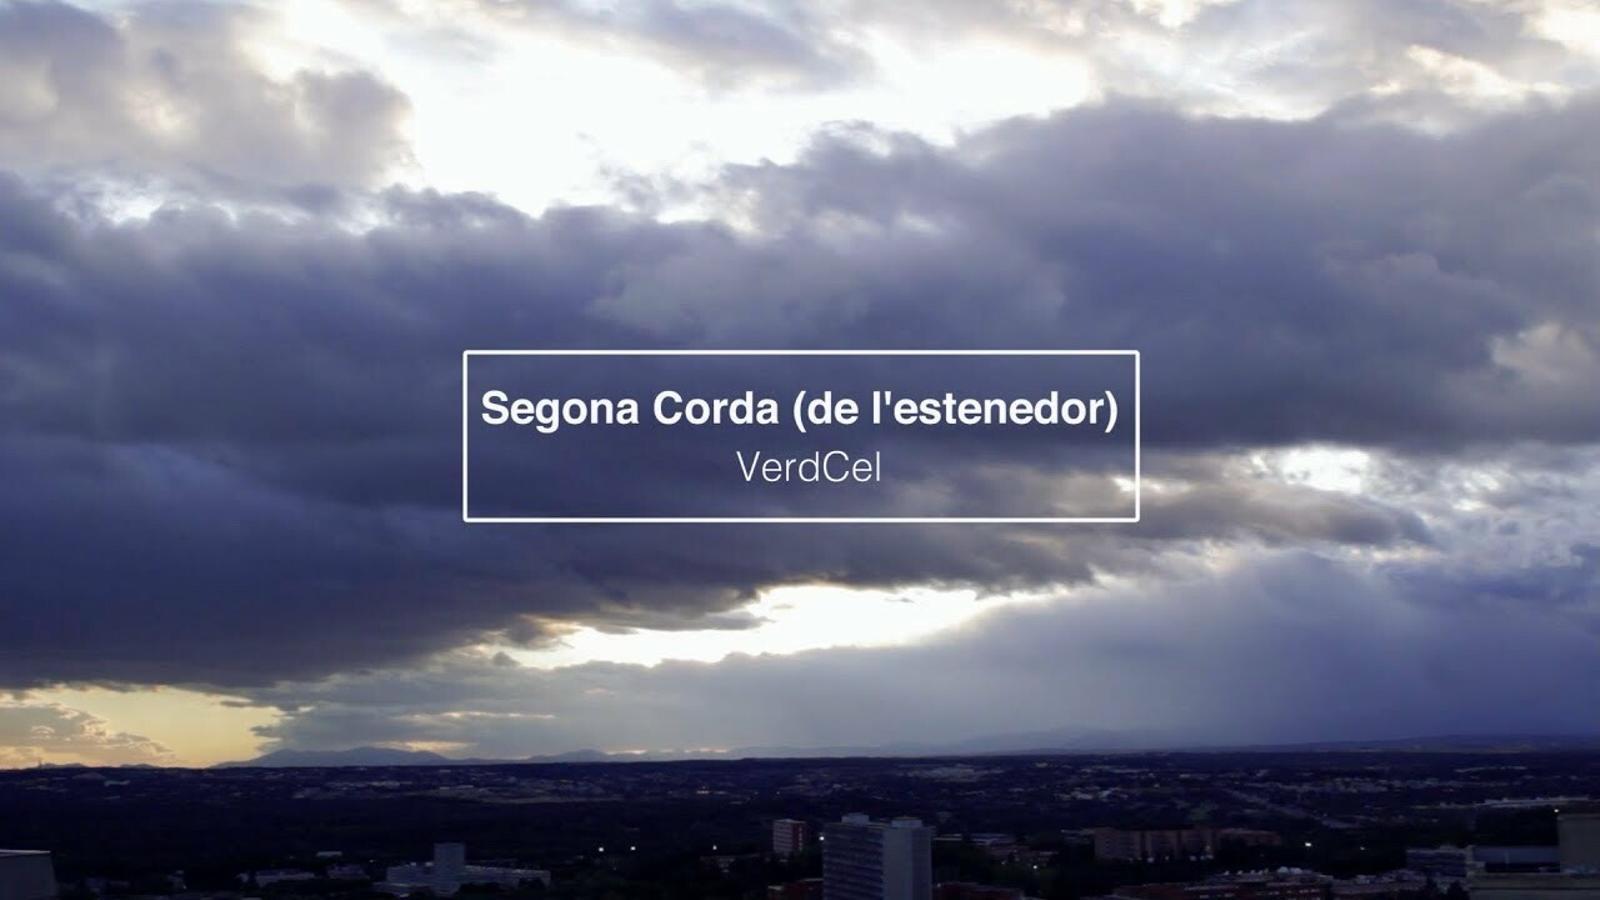 VerdCel, 'Segona corda (de l'estenedor)', videoclip